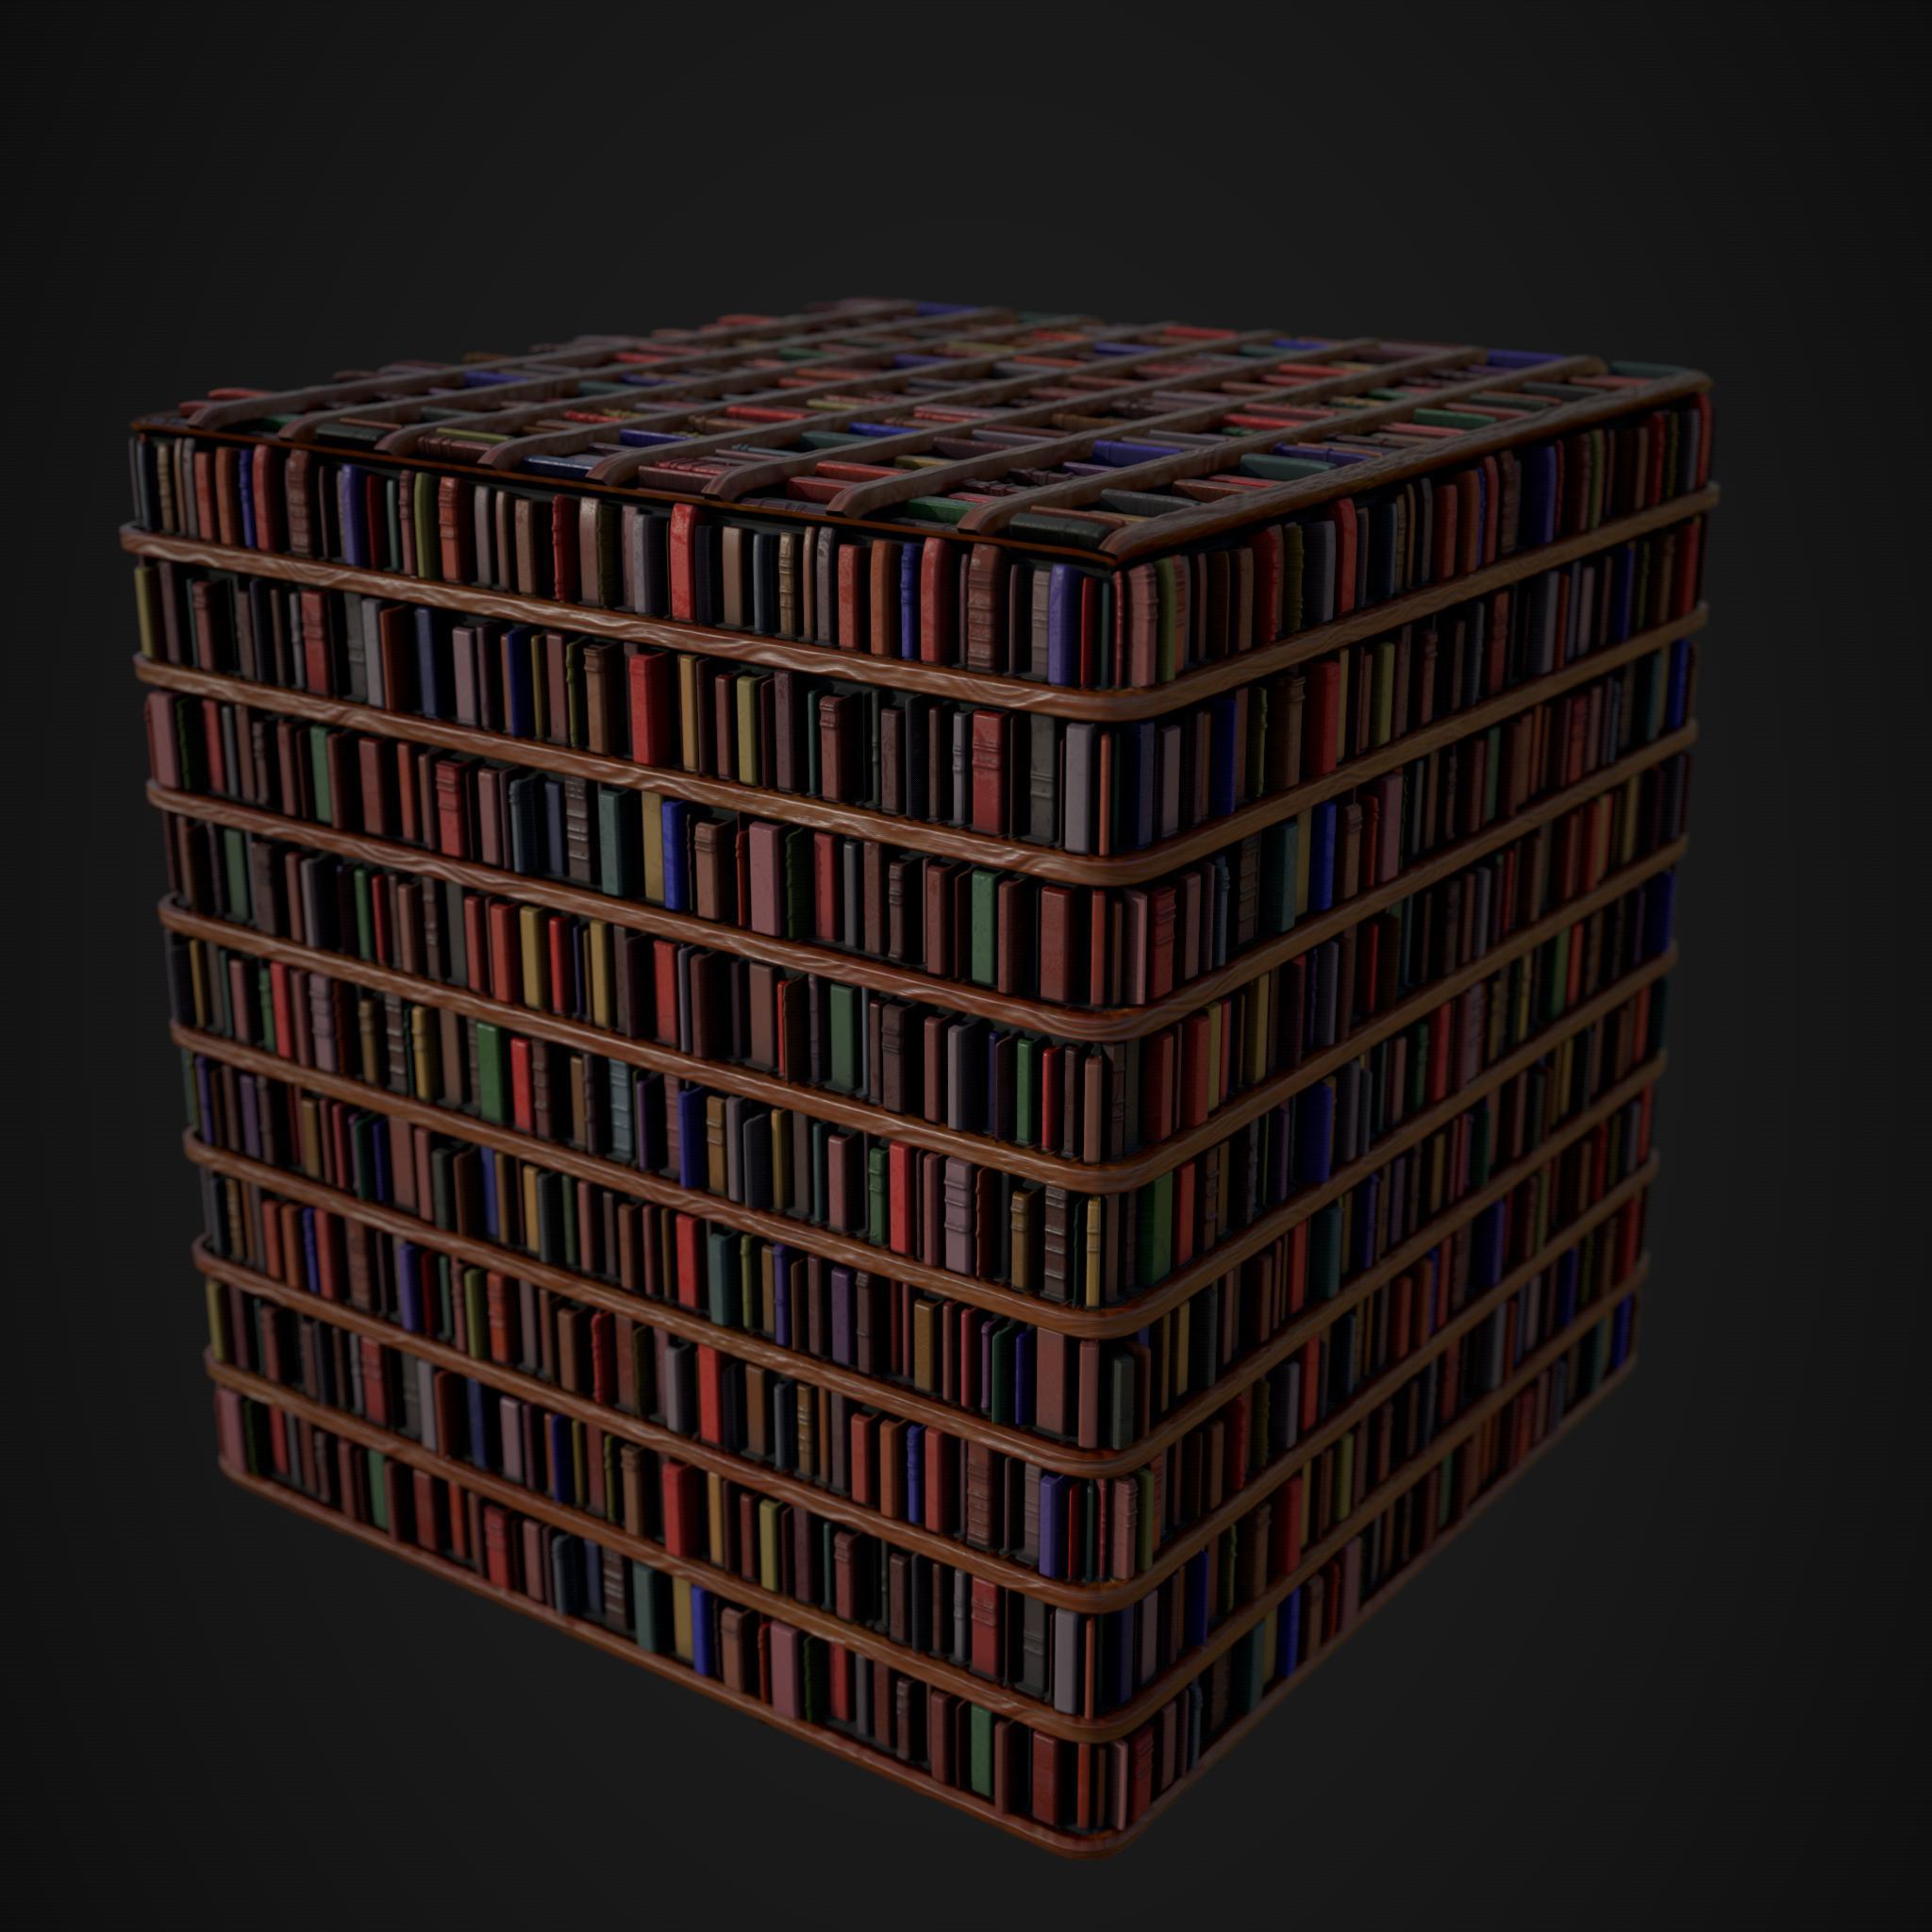 Library_Material_Render.jpg